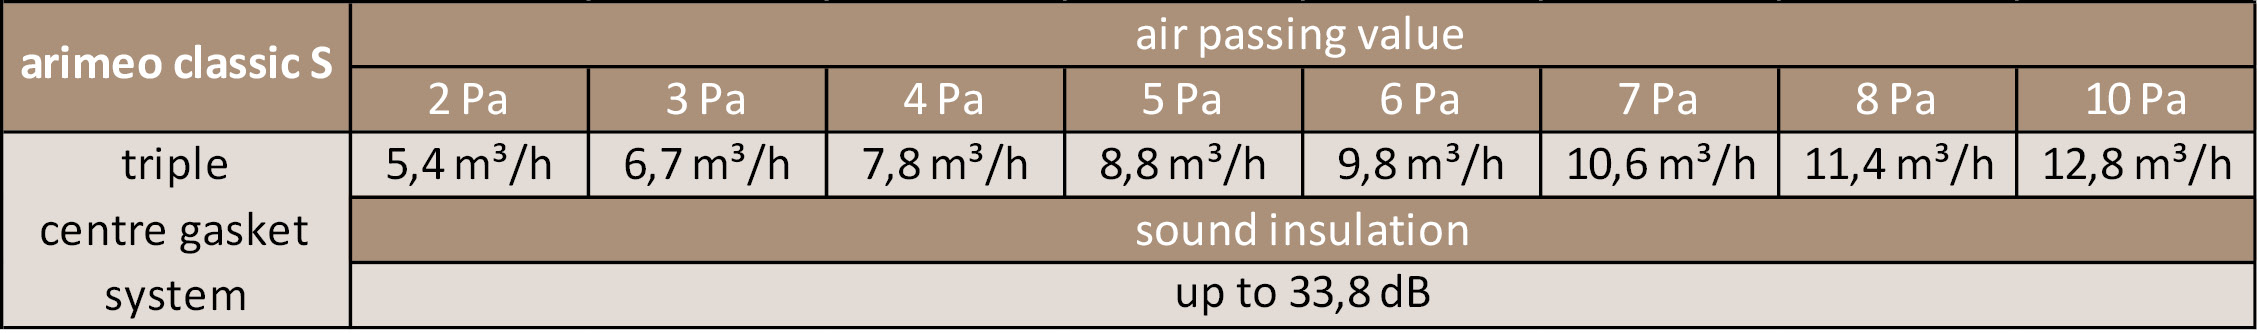 arimeo classic S performance data triple centre gasket system